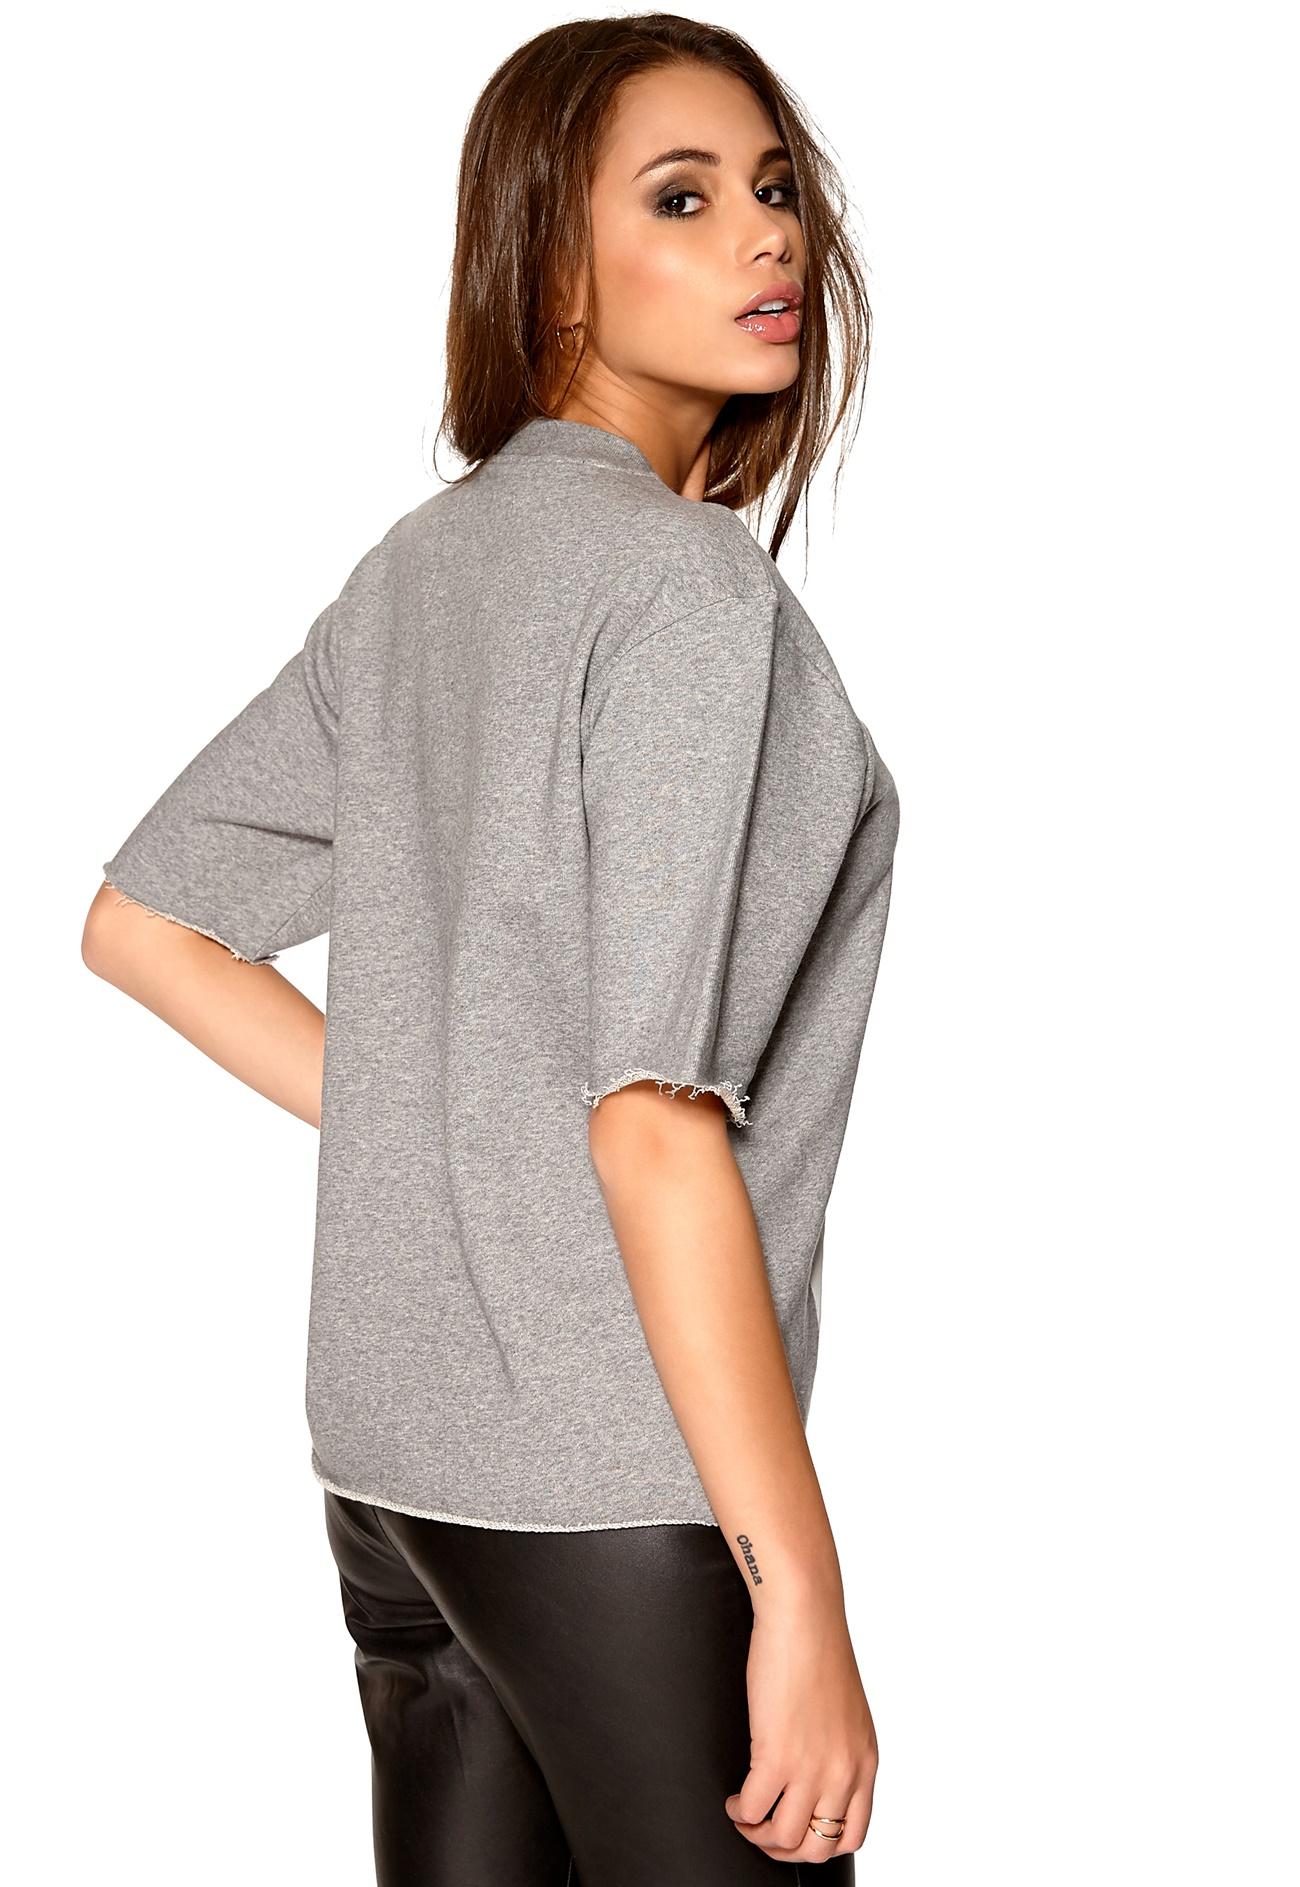 Back sweat banner t shirt grey marl bubbleroom for Grey marl t shirt